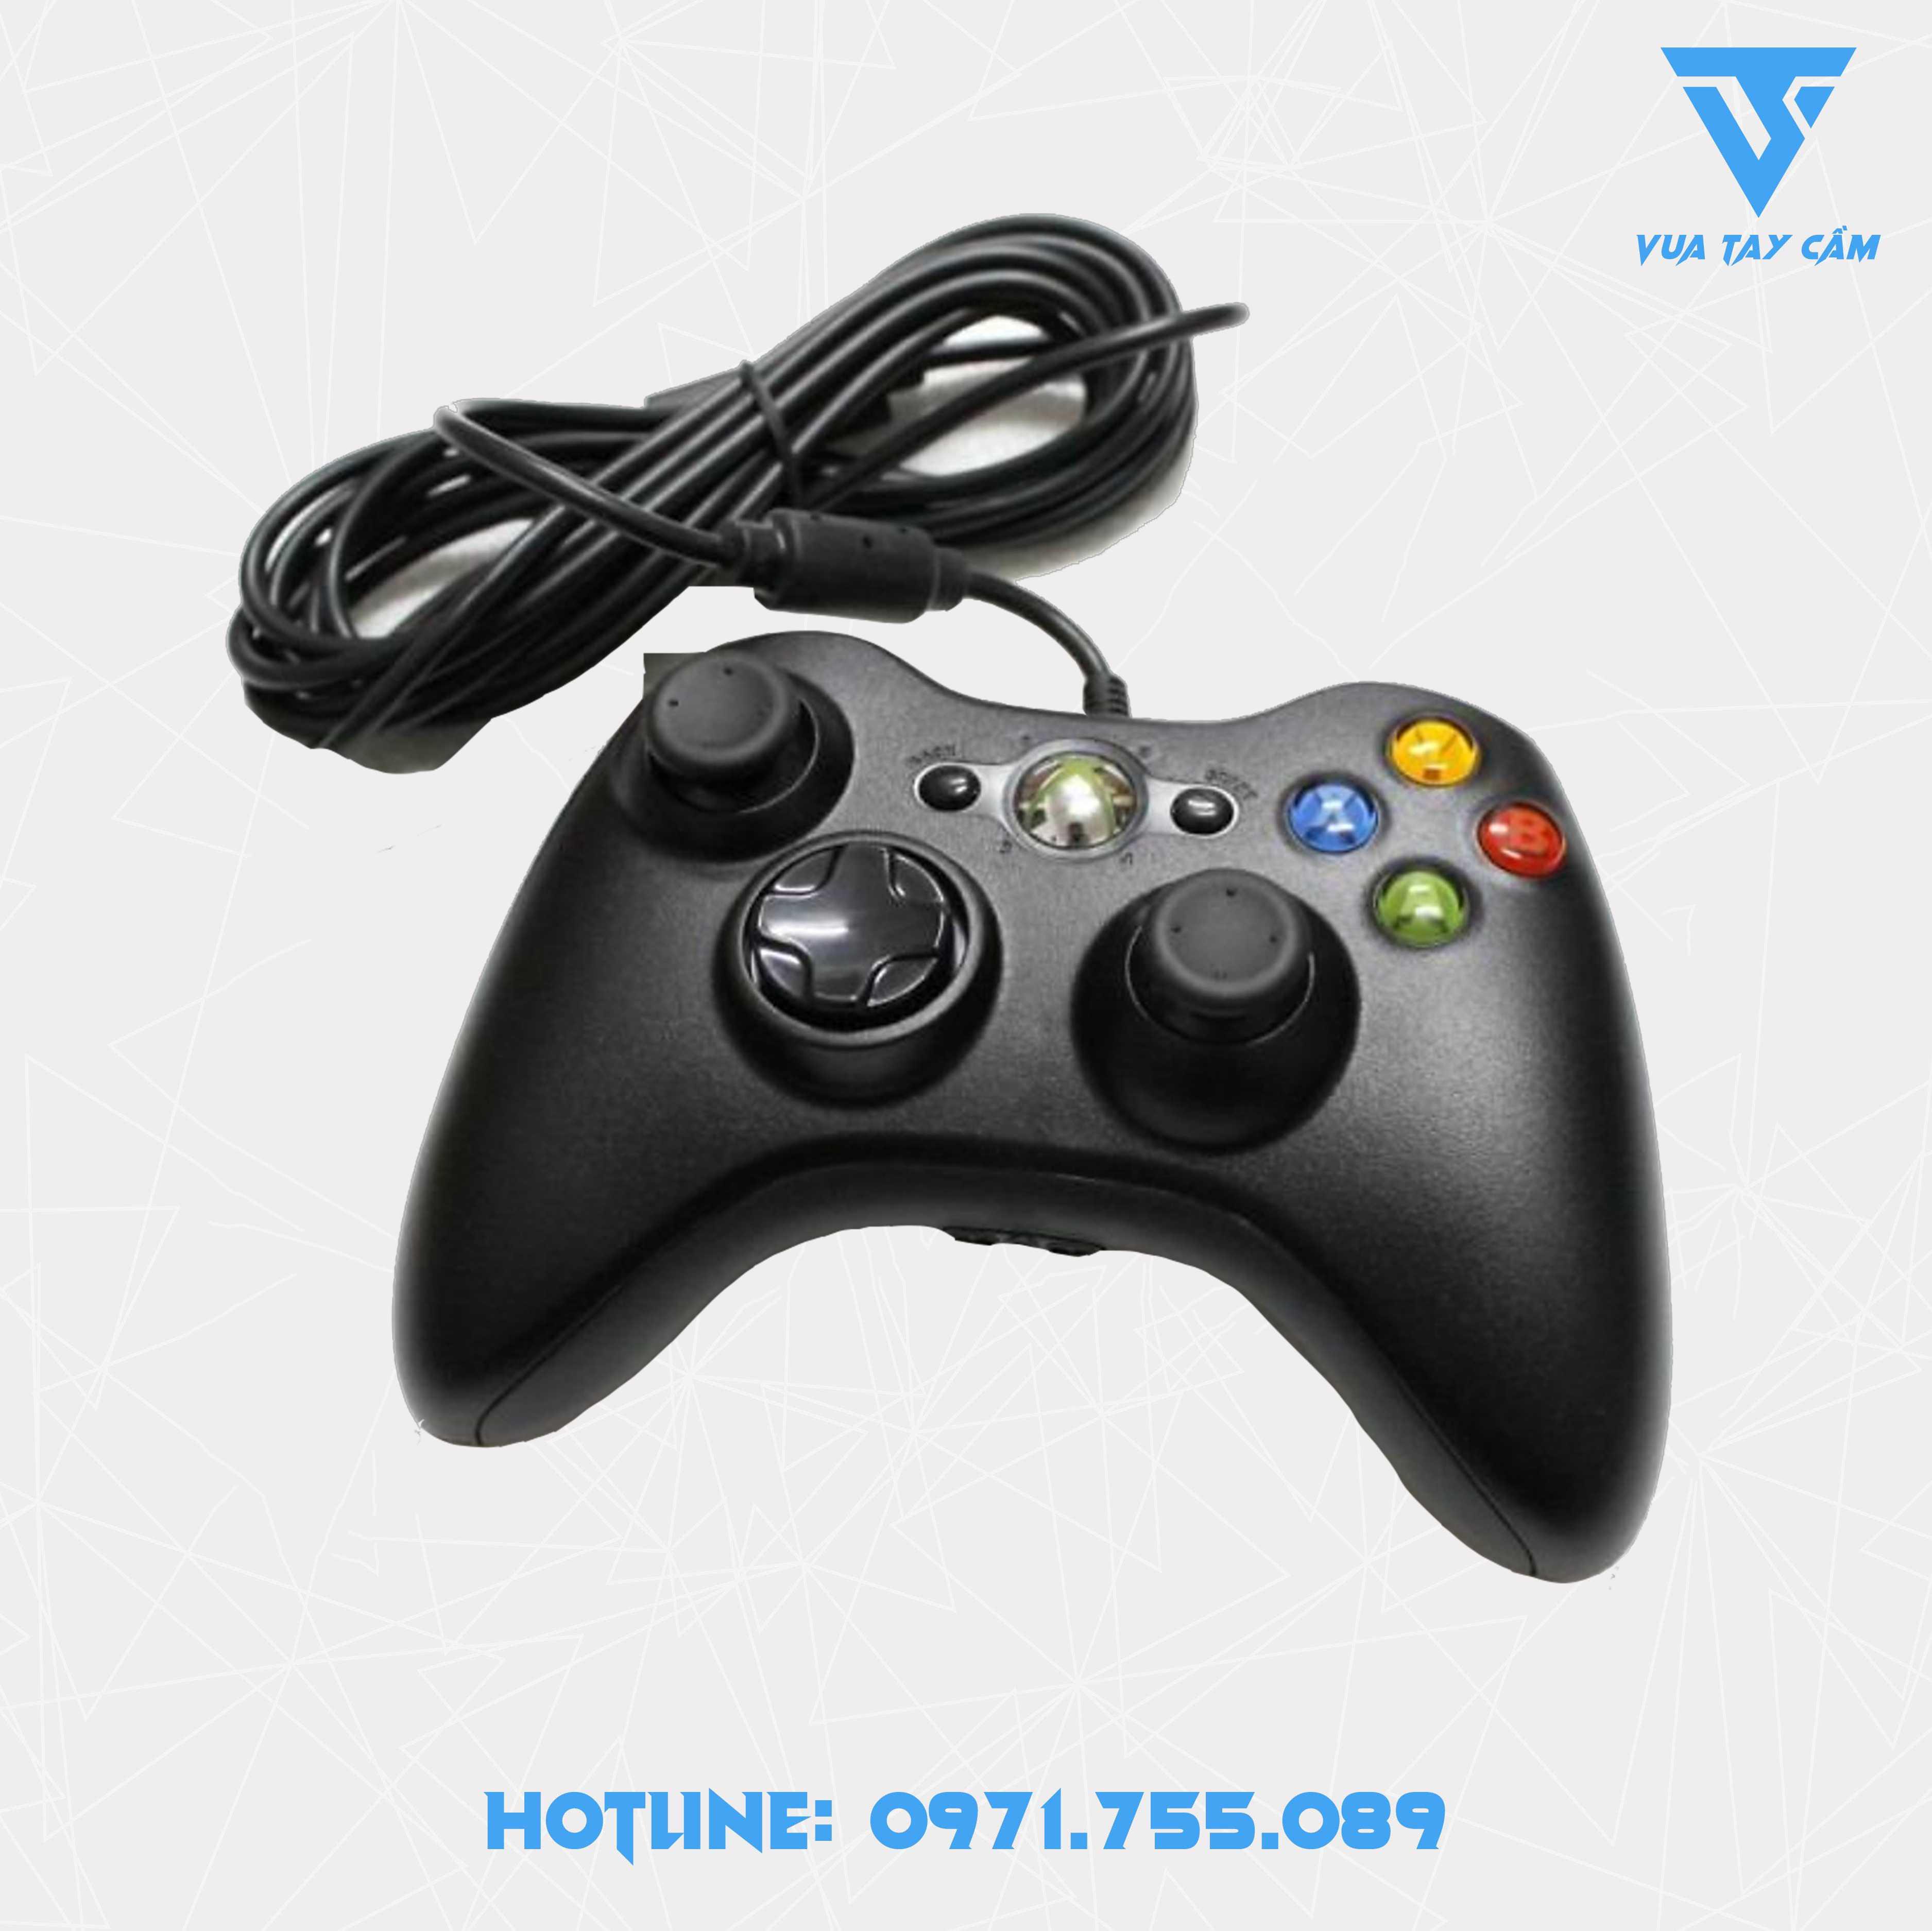 https://api.vuataycam.com/file/1602345120685-442007095-Tay-cam-choi-game-xbox-360-thuong.jpg